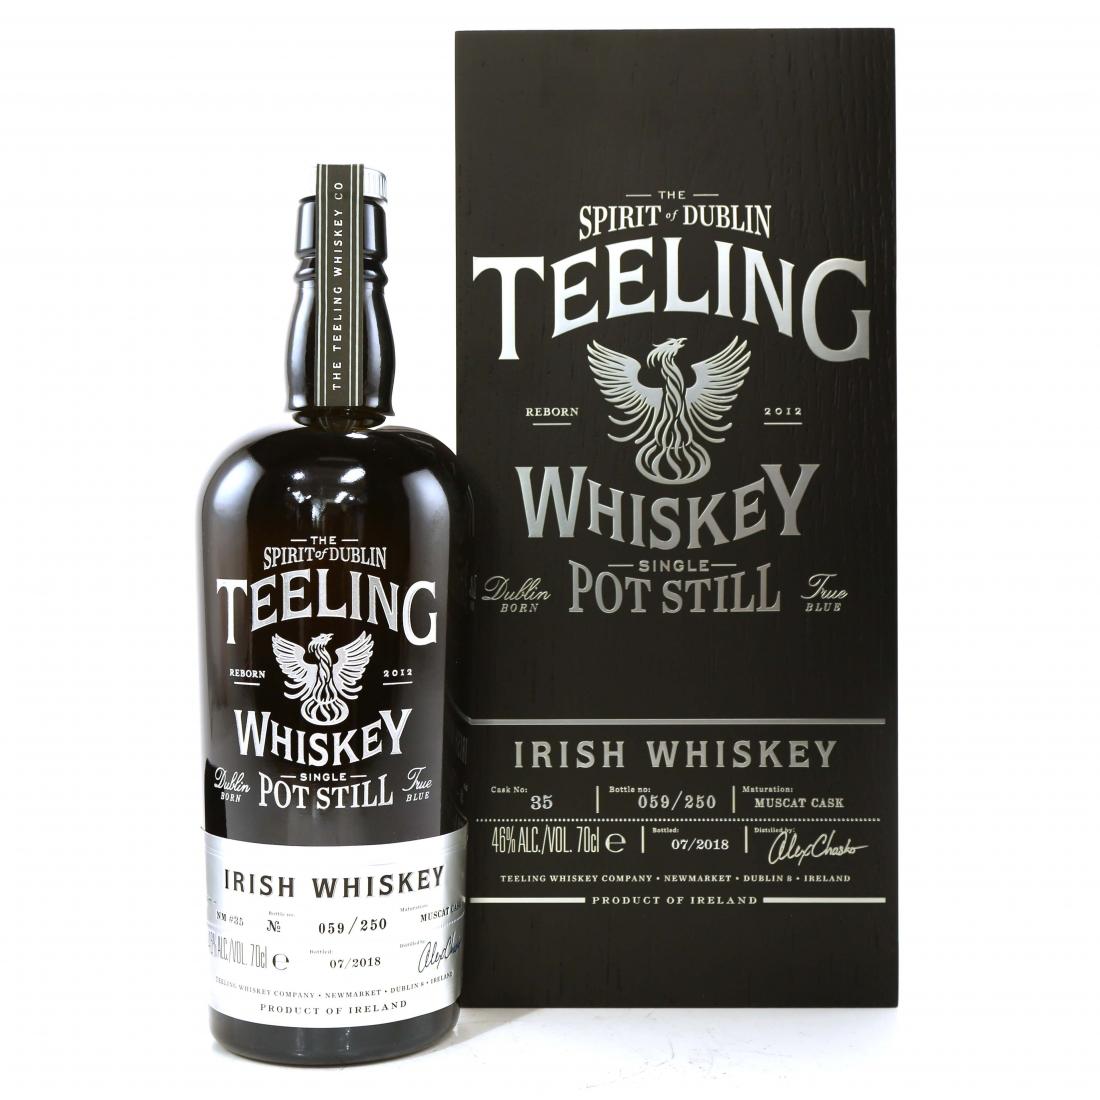 Teeling Celebratory Single Pot Still Whiskey / Bottle #059